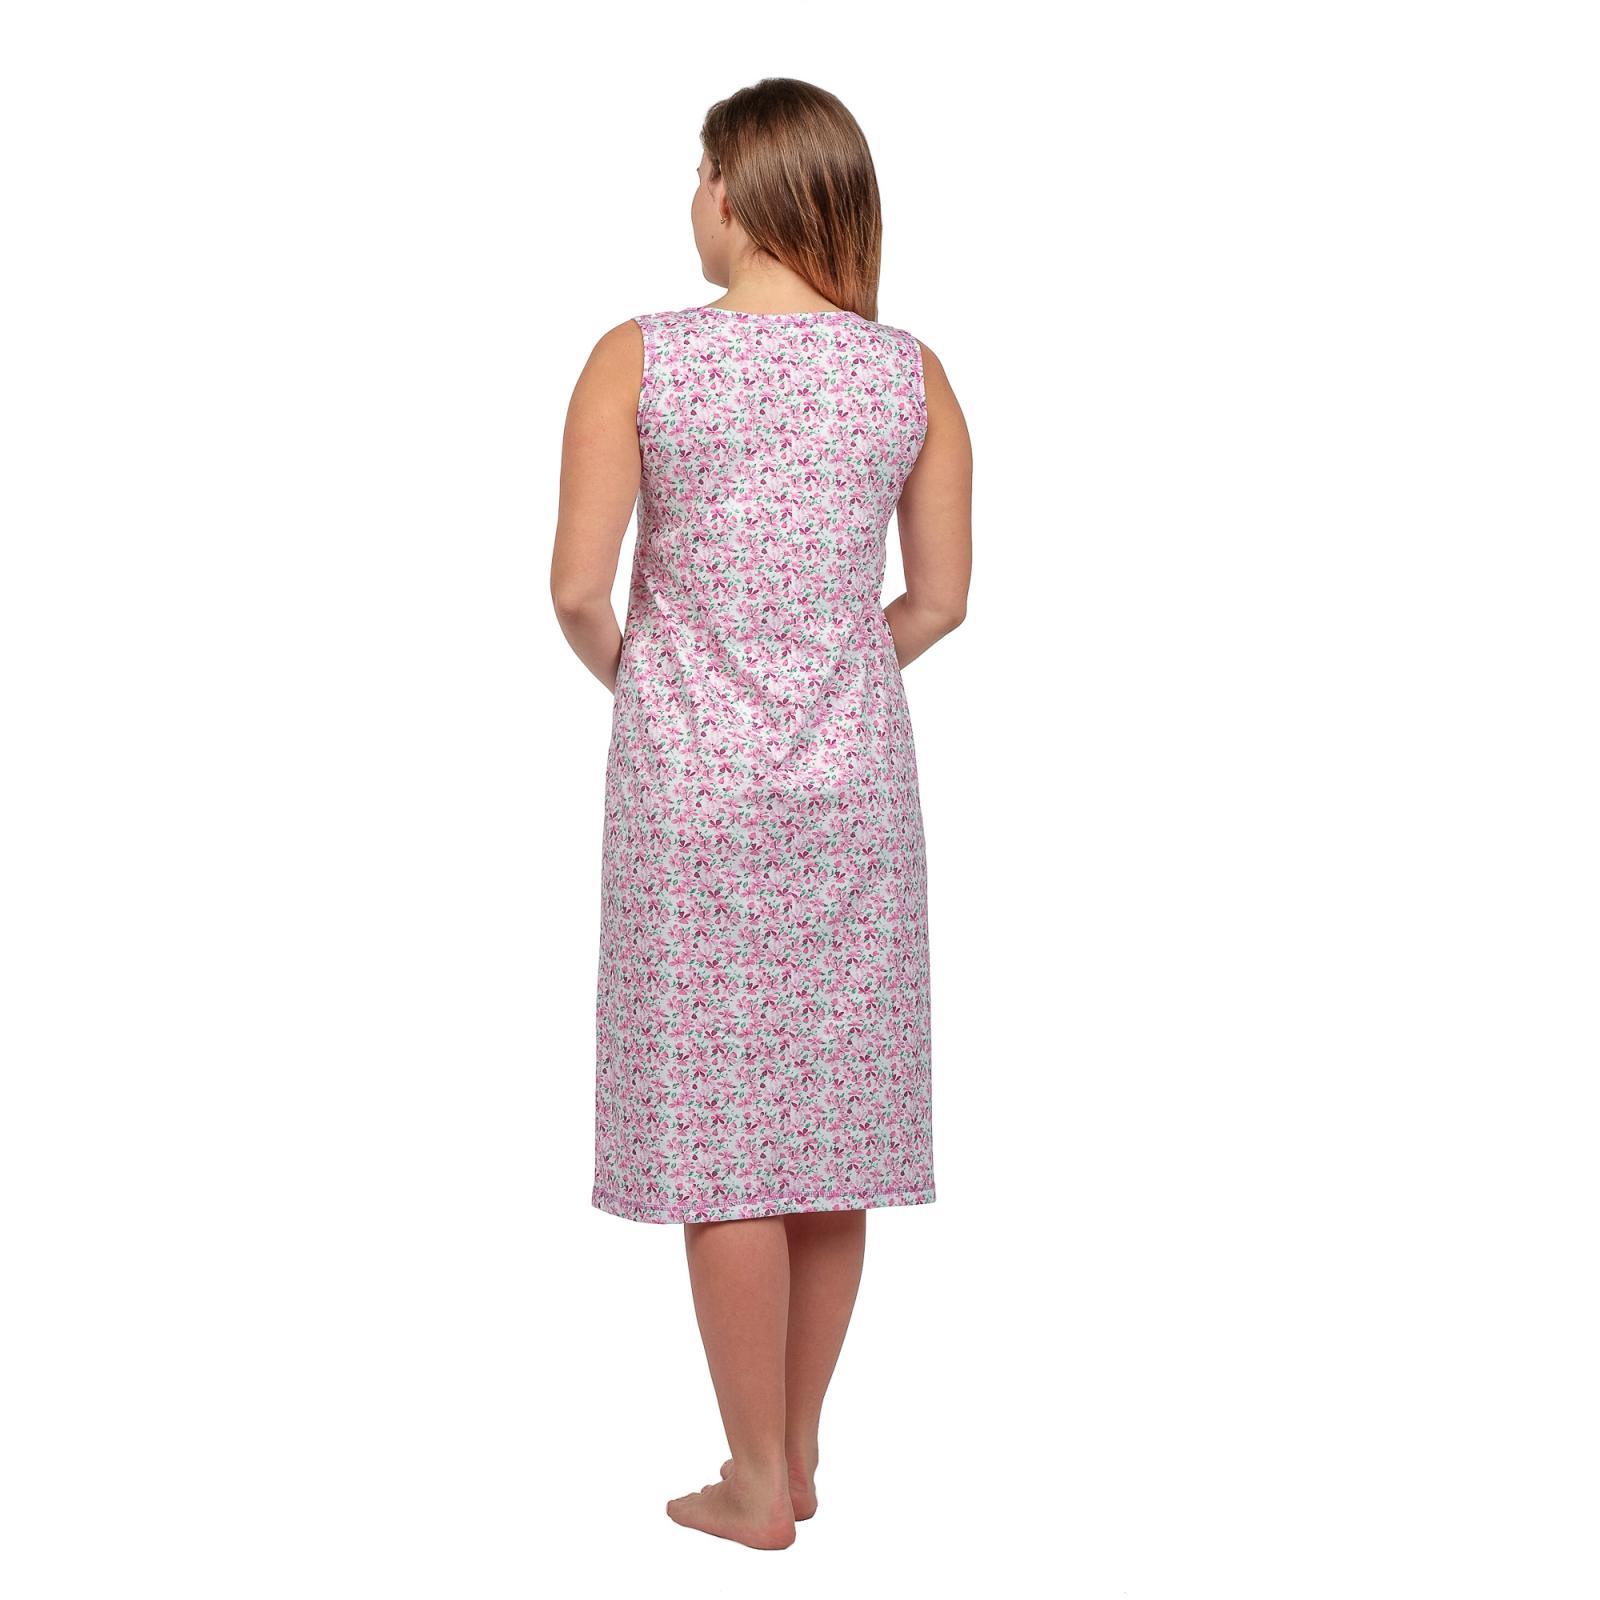 Ночная сорочка (бабушкина) Розовые цветы М-0042Р